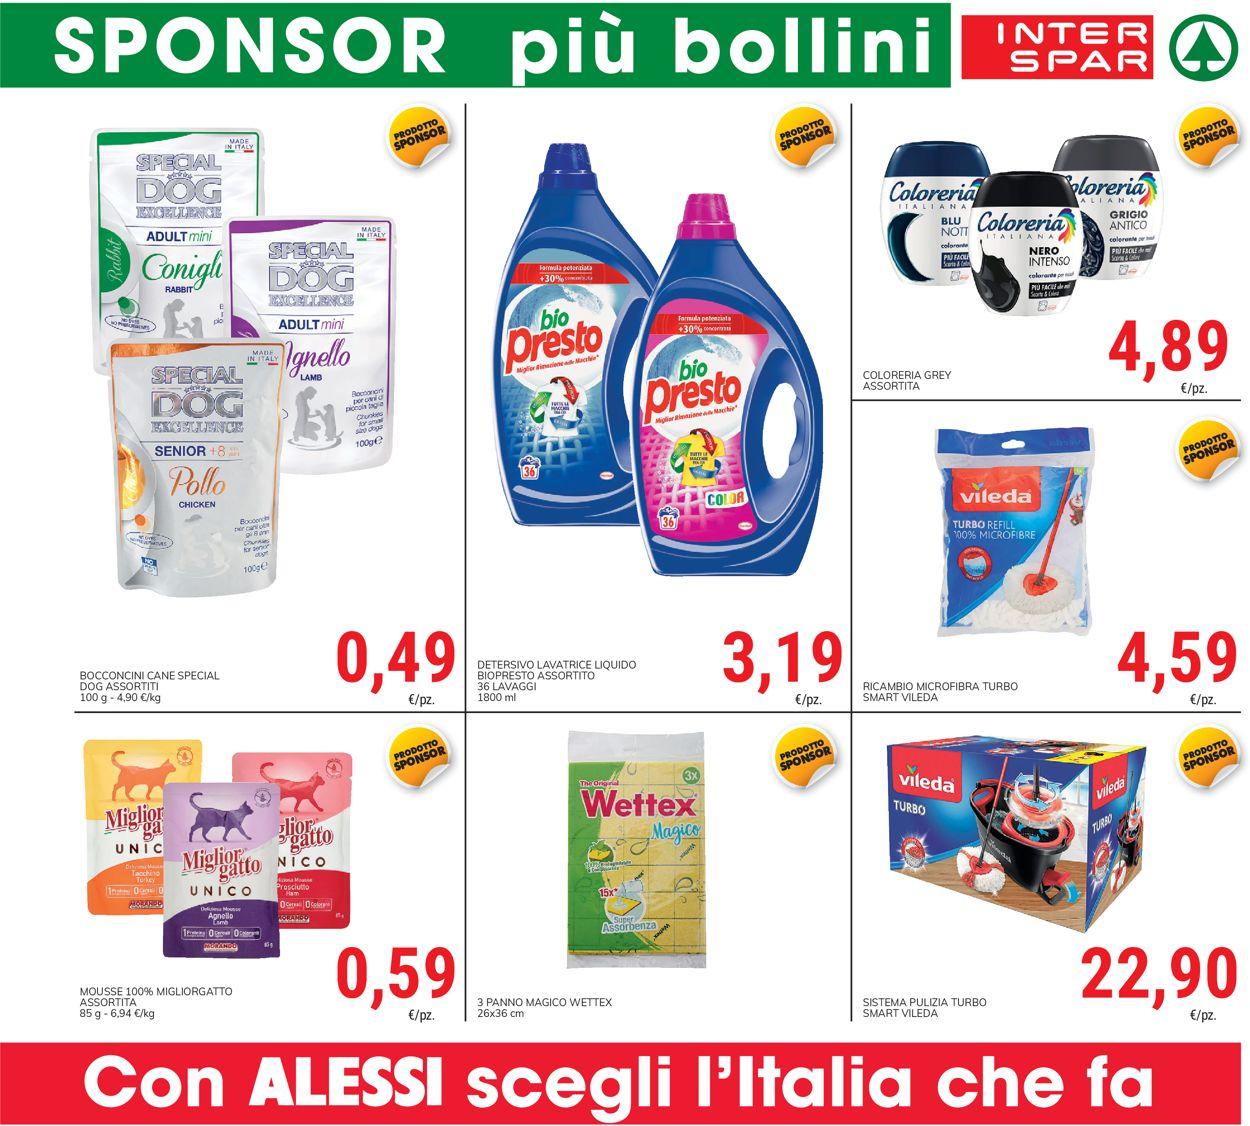 Volantino Interspar - Offerte 05/04-28/04/2021 (Pagina 11)